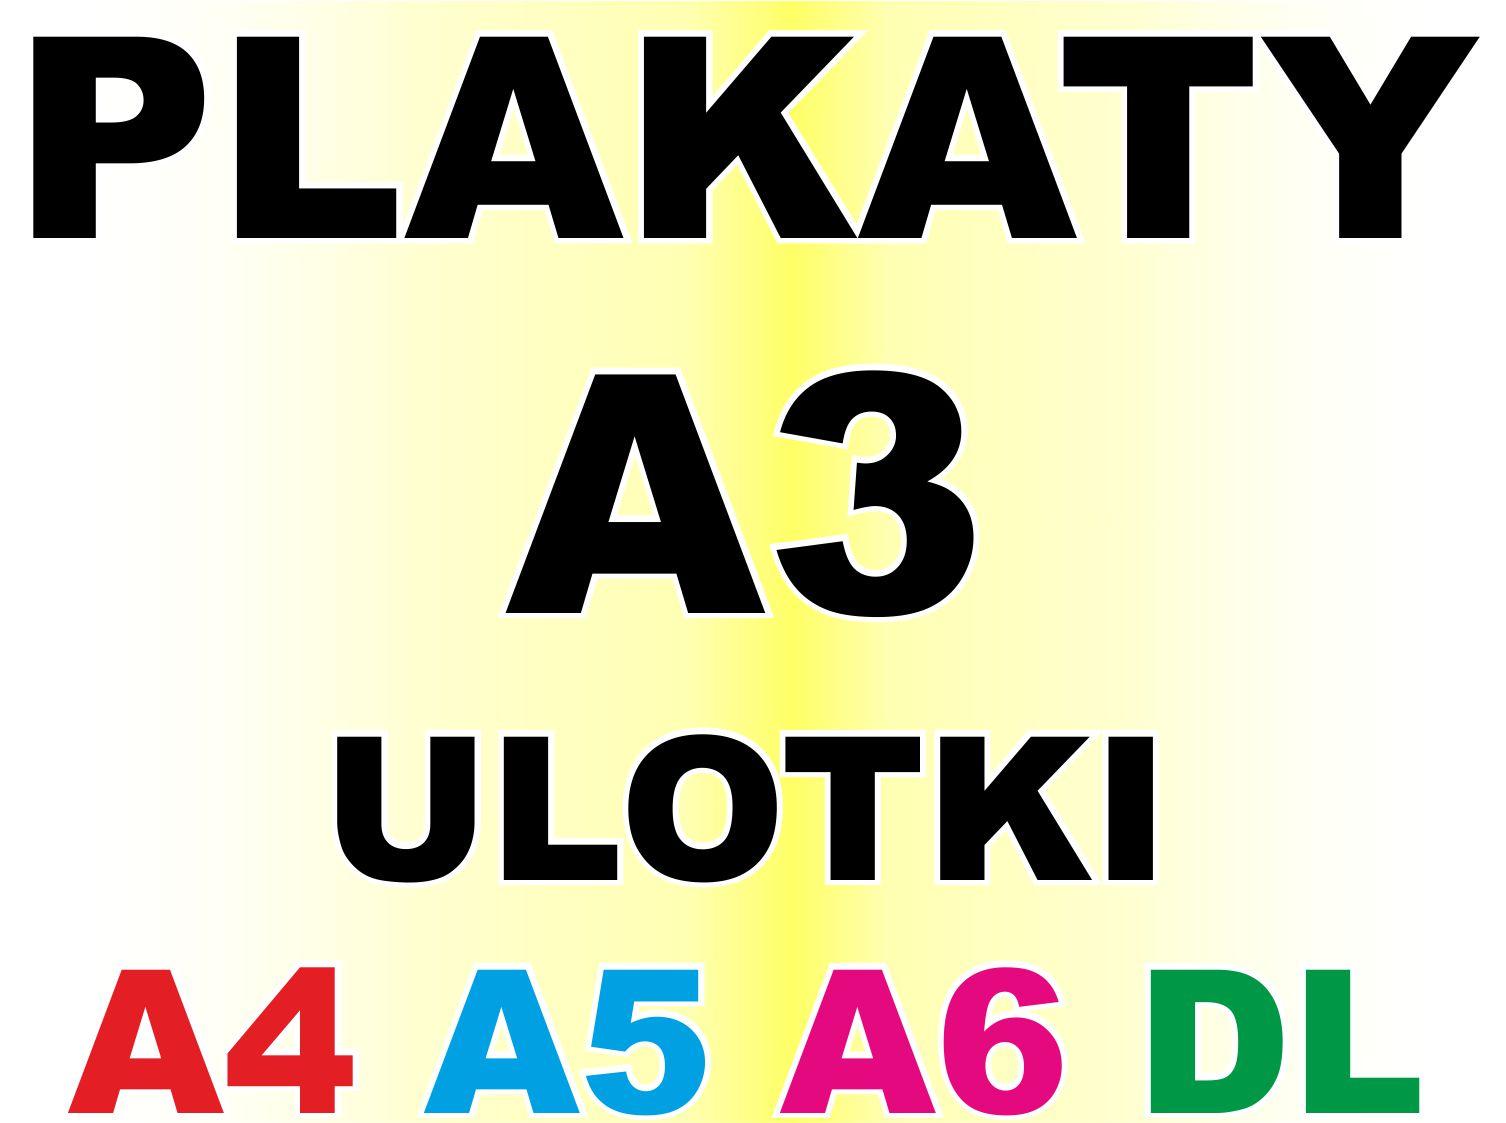 Plakaty A3 Plakat Ulotka Ulotki A4 A5 A6 Dl Na Szt